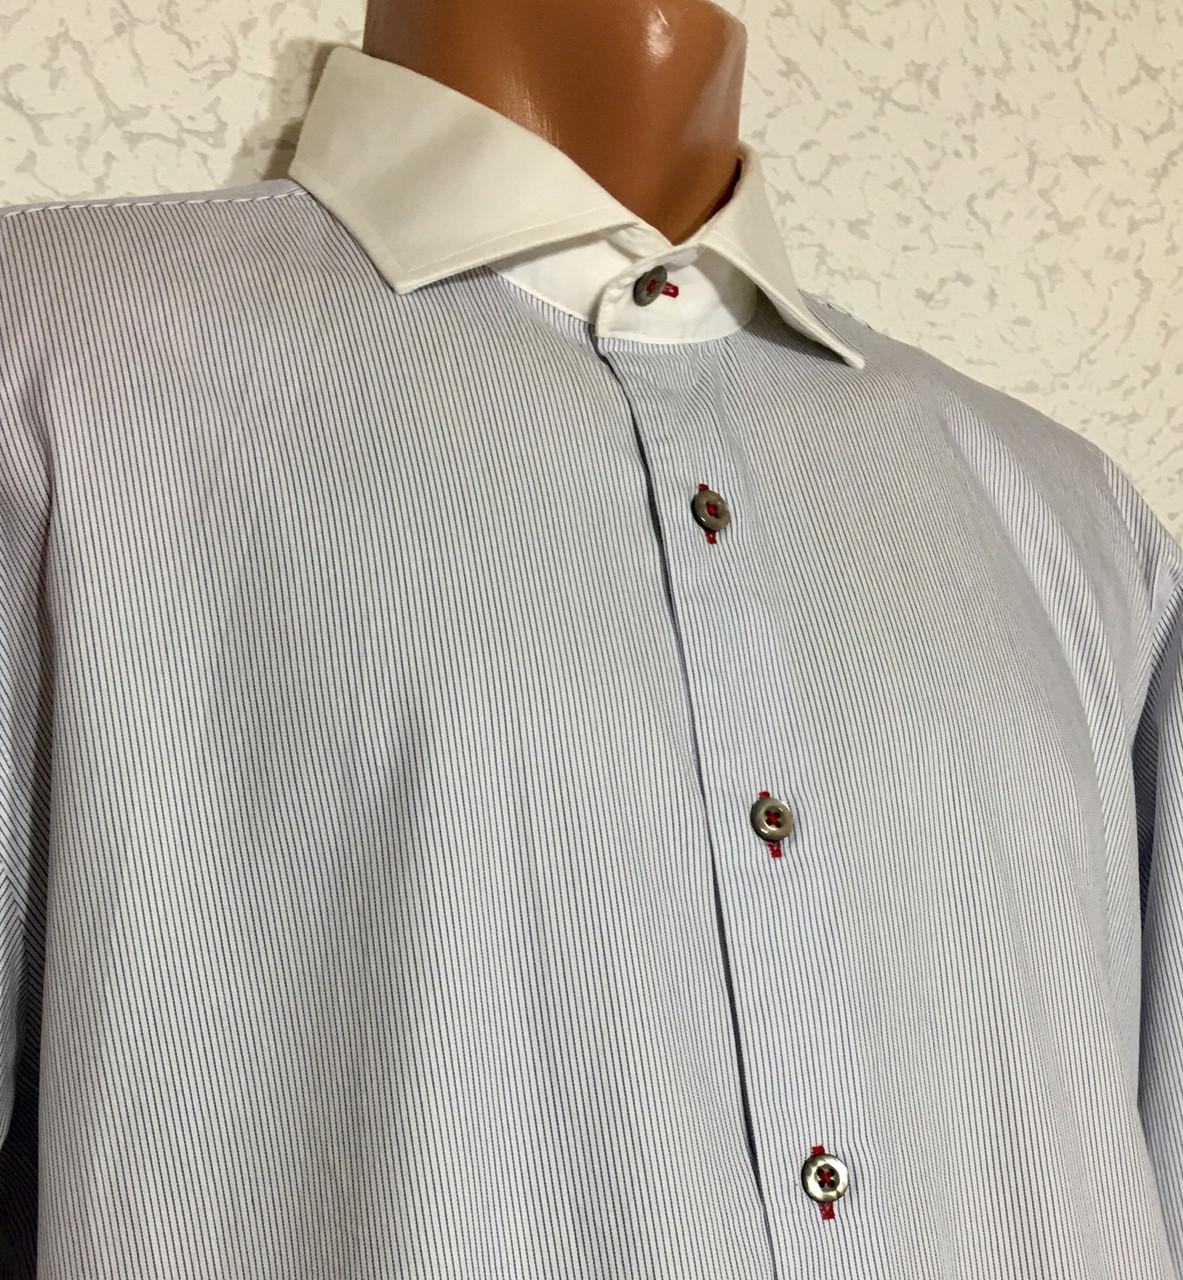 Рубашка мужская Egyptian cotton (Xl /44)